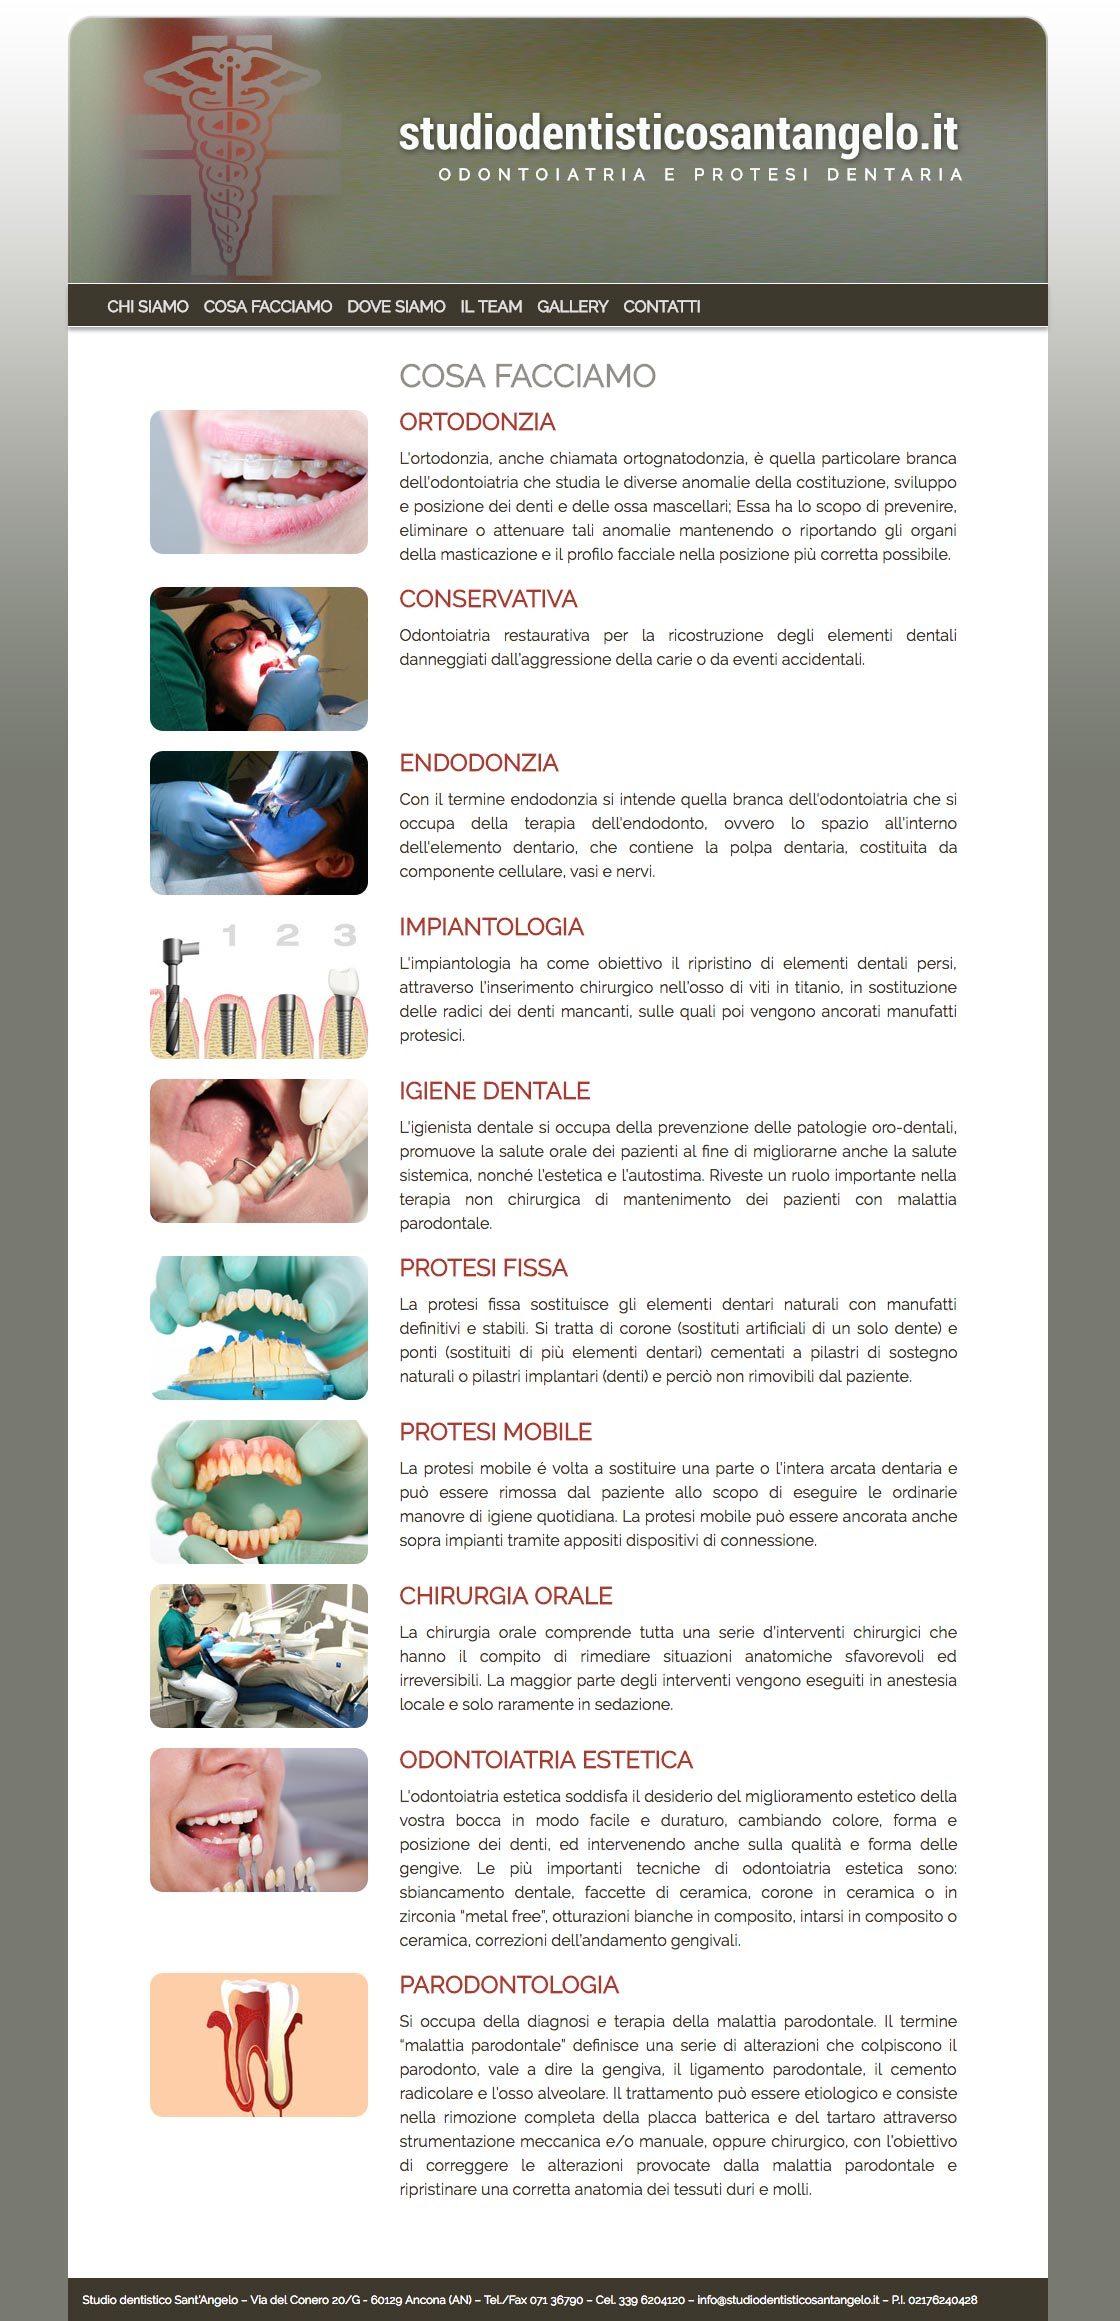 Studio-dentistico-Sant-Angelo--Conservativa--Endodonzia--Impiantologia--Igiene-dentale--Protesi-fissa--Protesi-mobile--Chirurgia-orale-Odontoiatria-estetica--Paradontologia